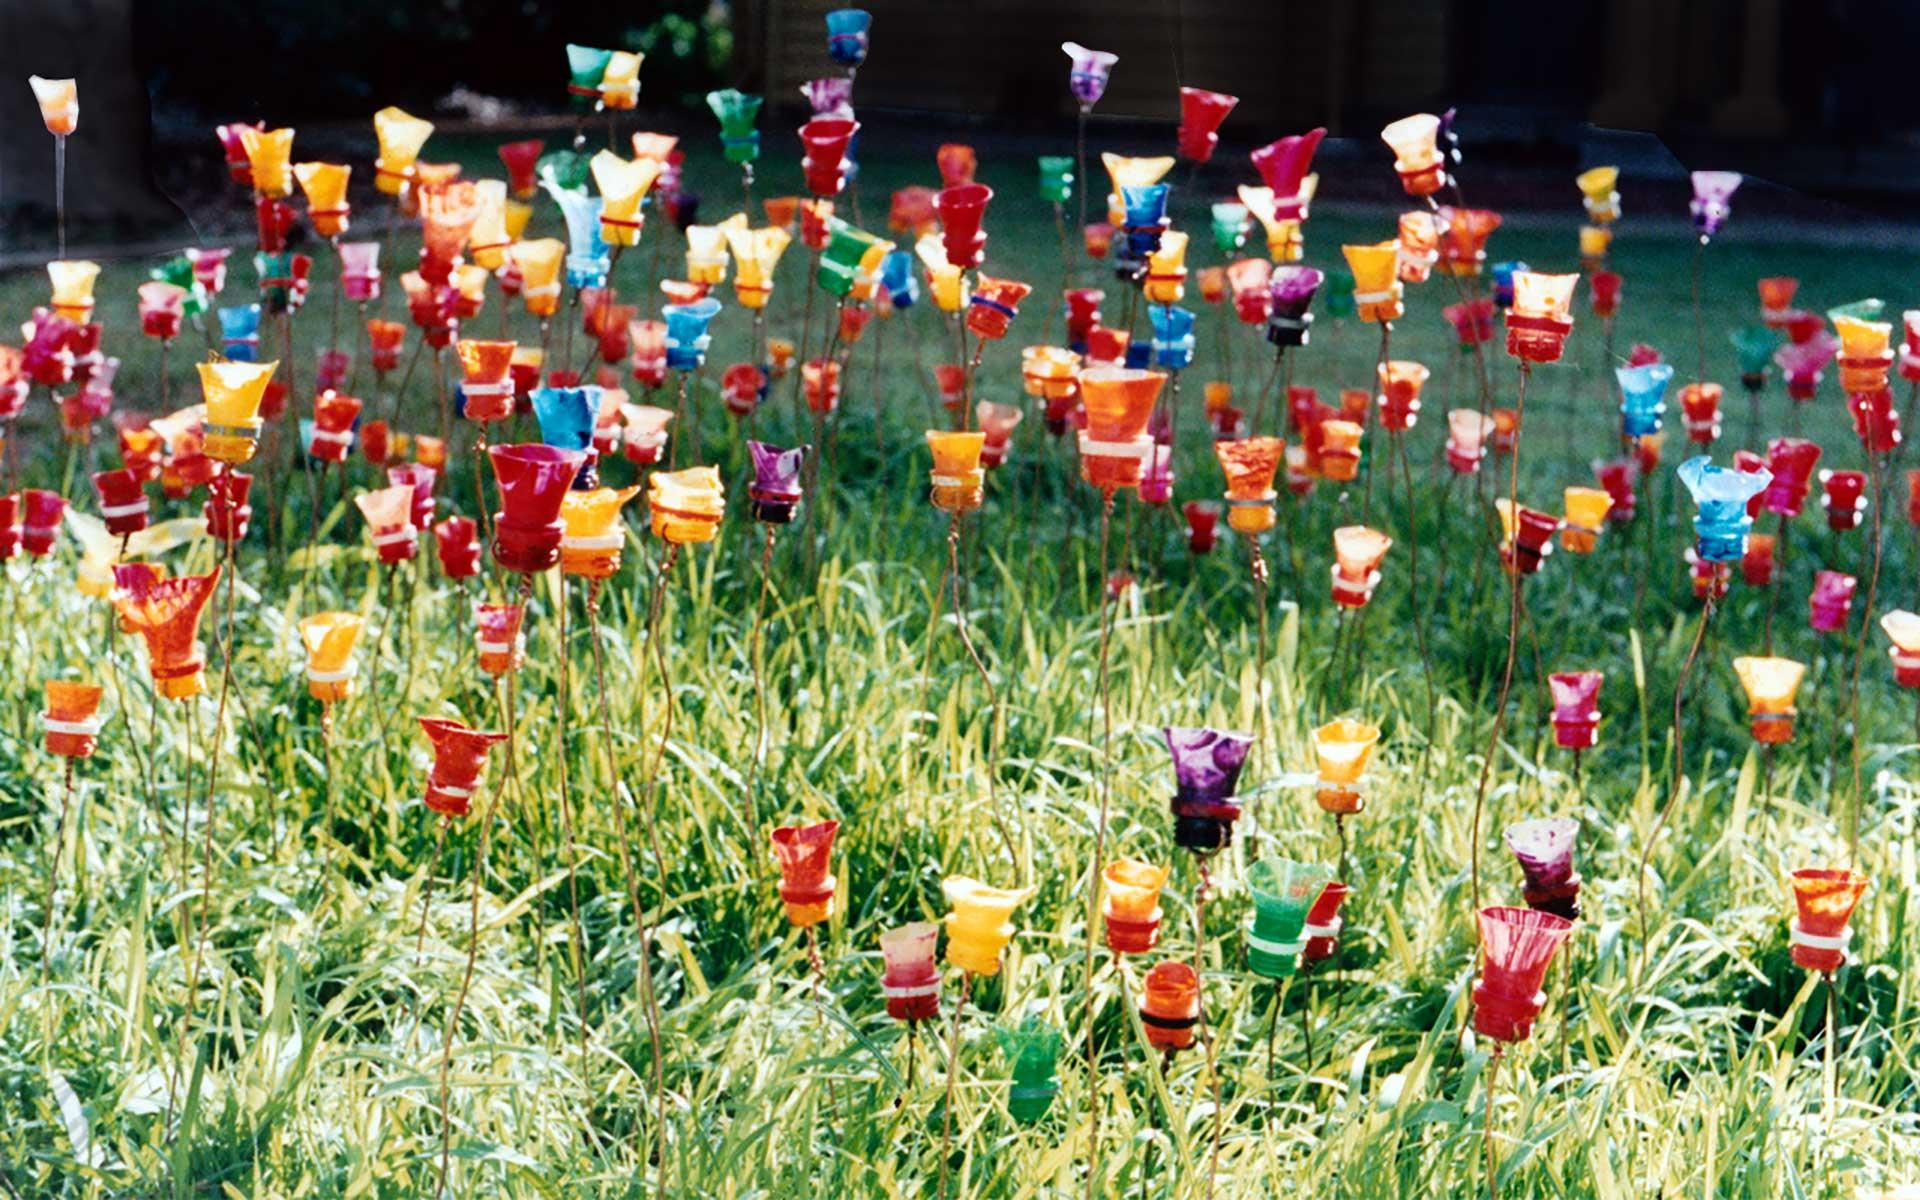 In flanders fields the poppies blow